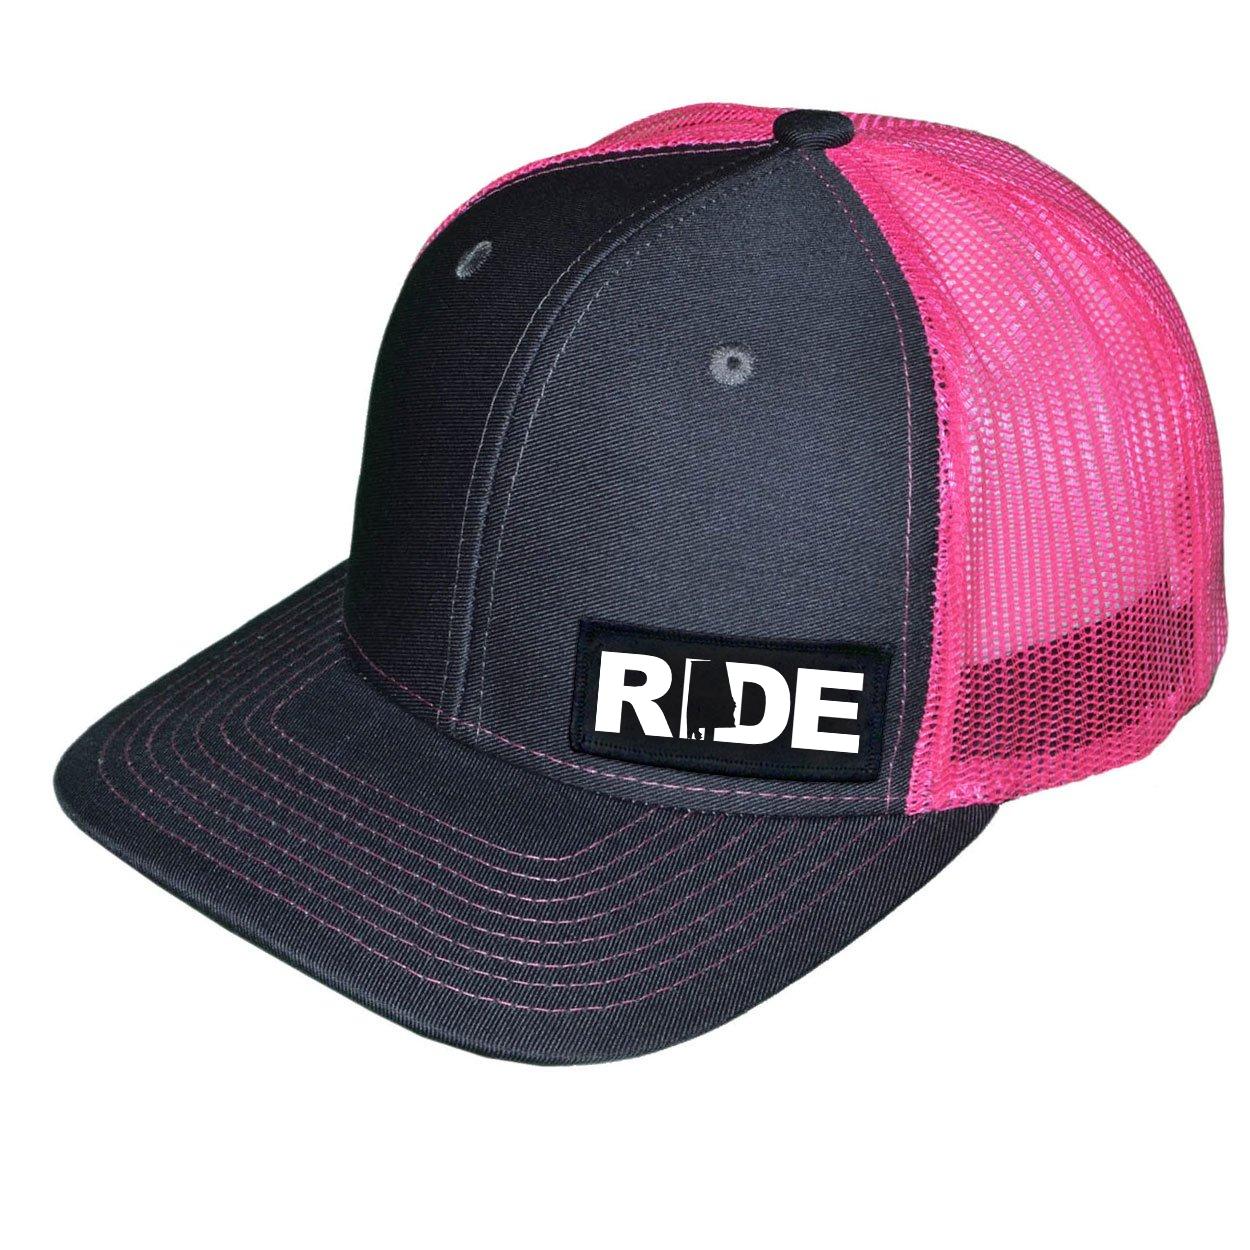 Ride Alabama Night Out Woven Patch Snapback Trucker Hat Dark Gray/Neon Pink (White Logo)